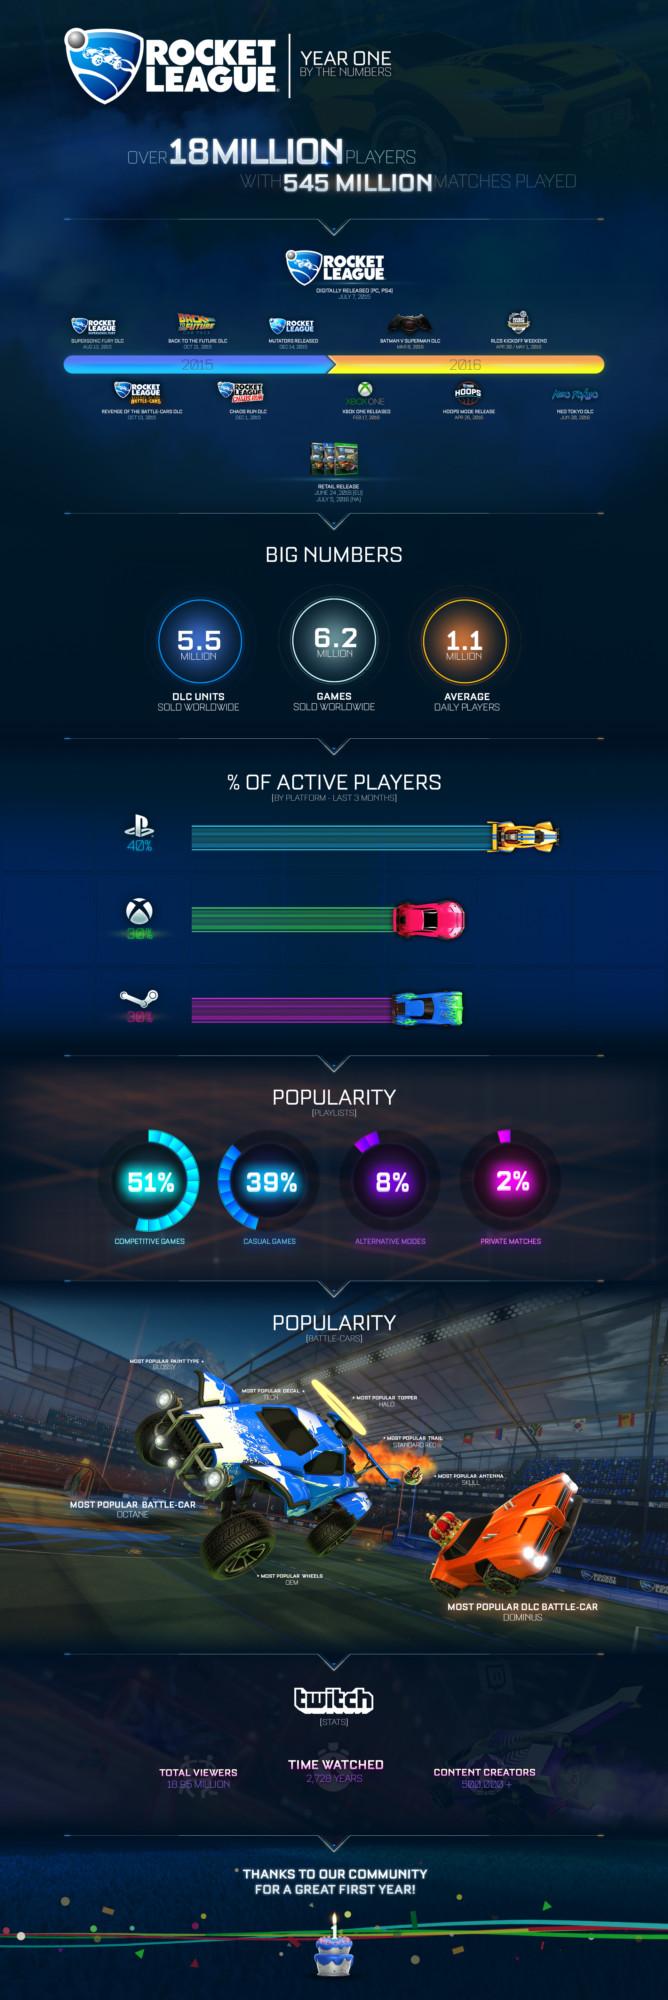 RL_Infographic_1st-_Birthday-gamersrd.com